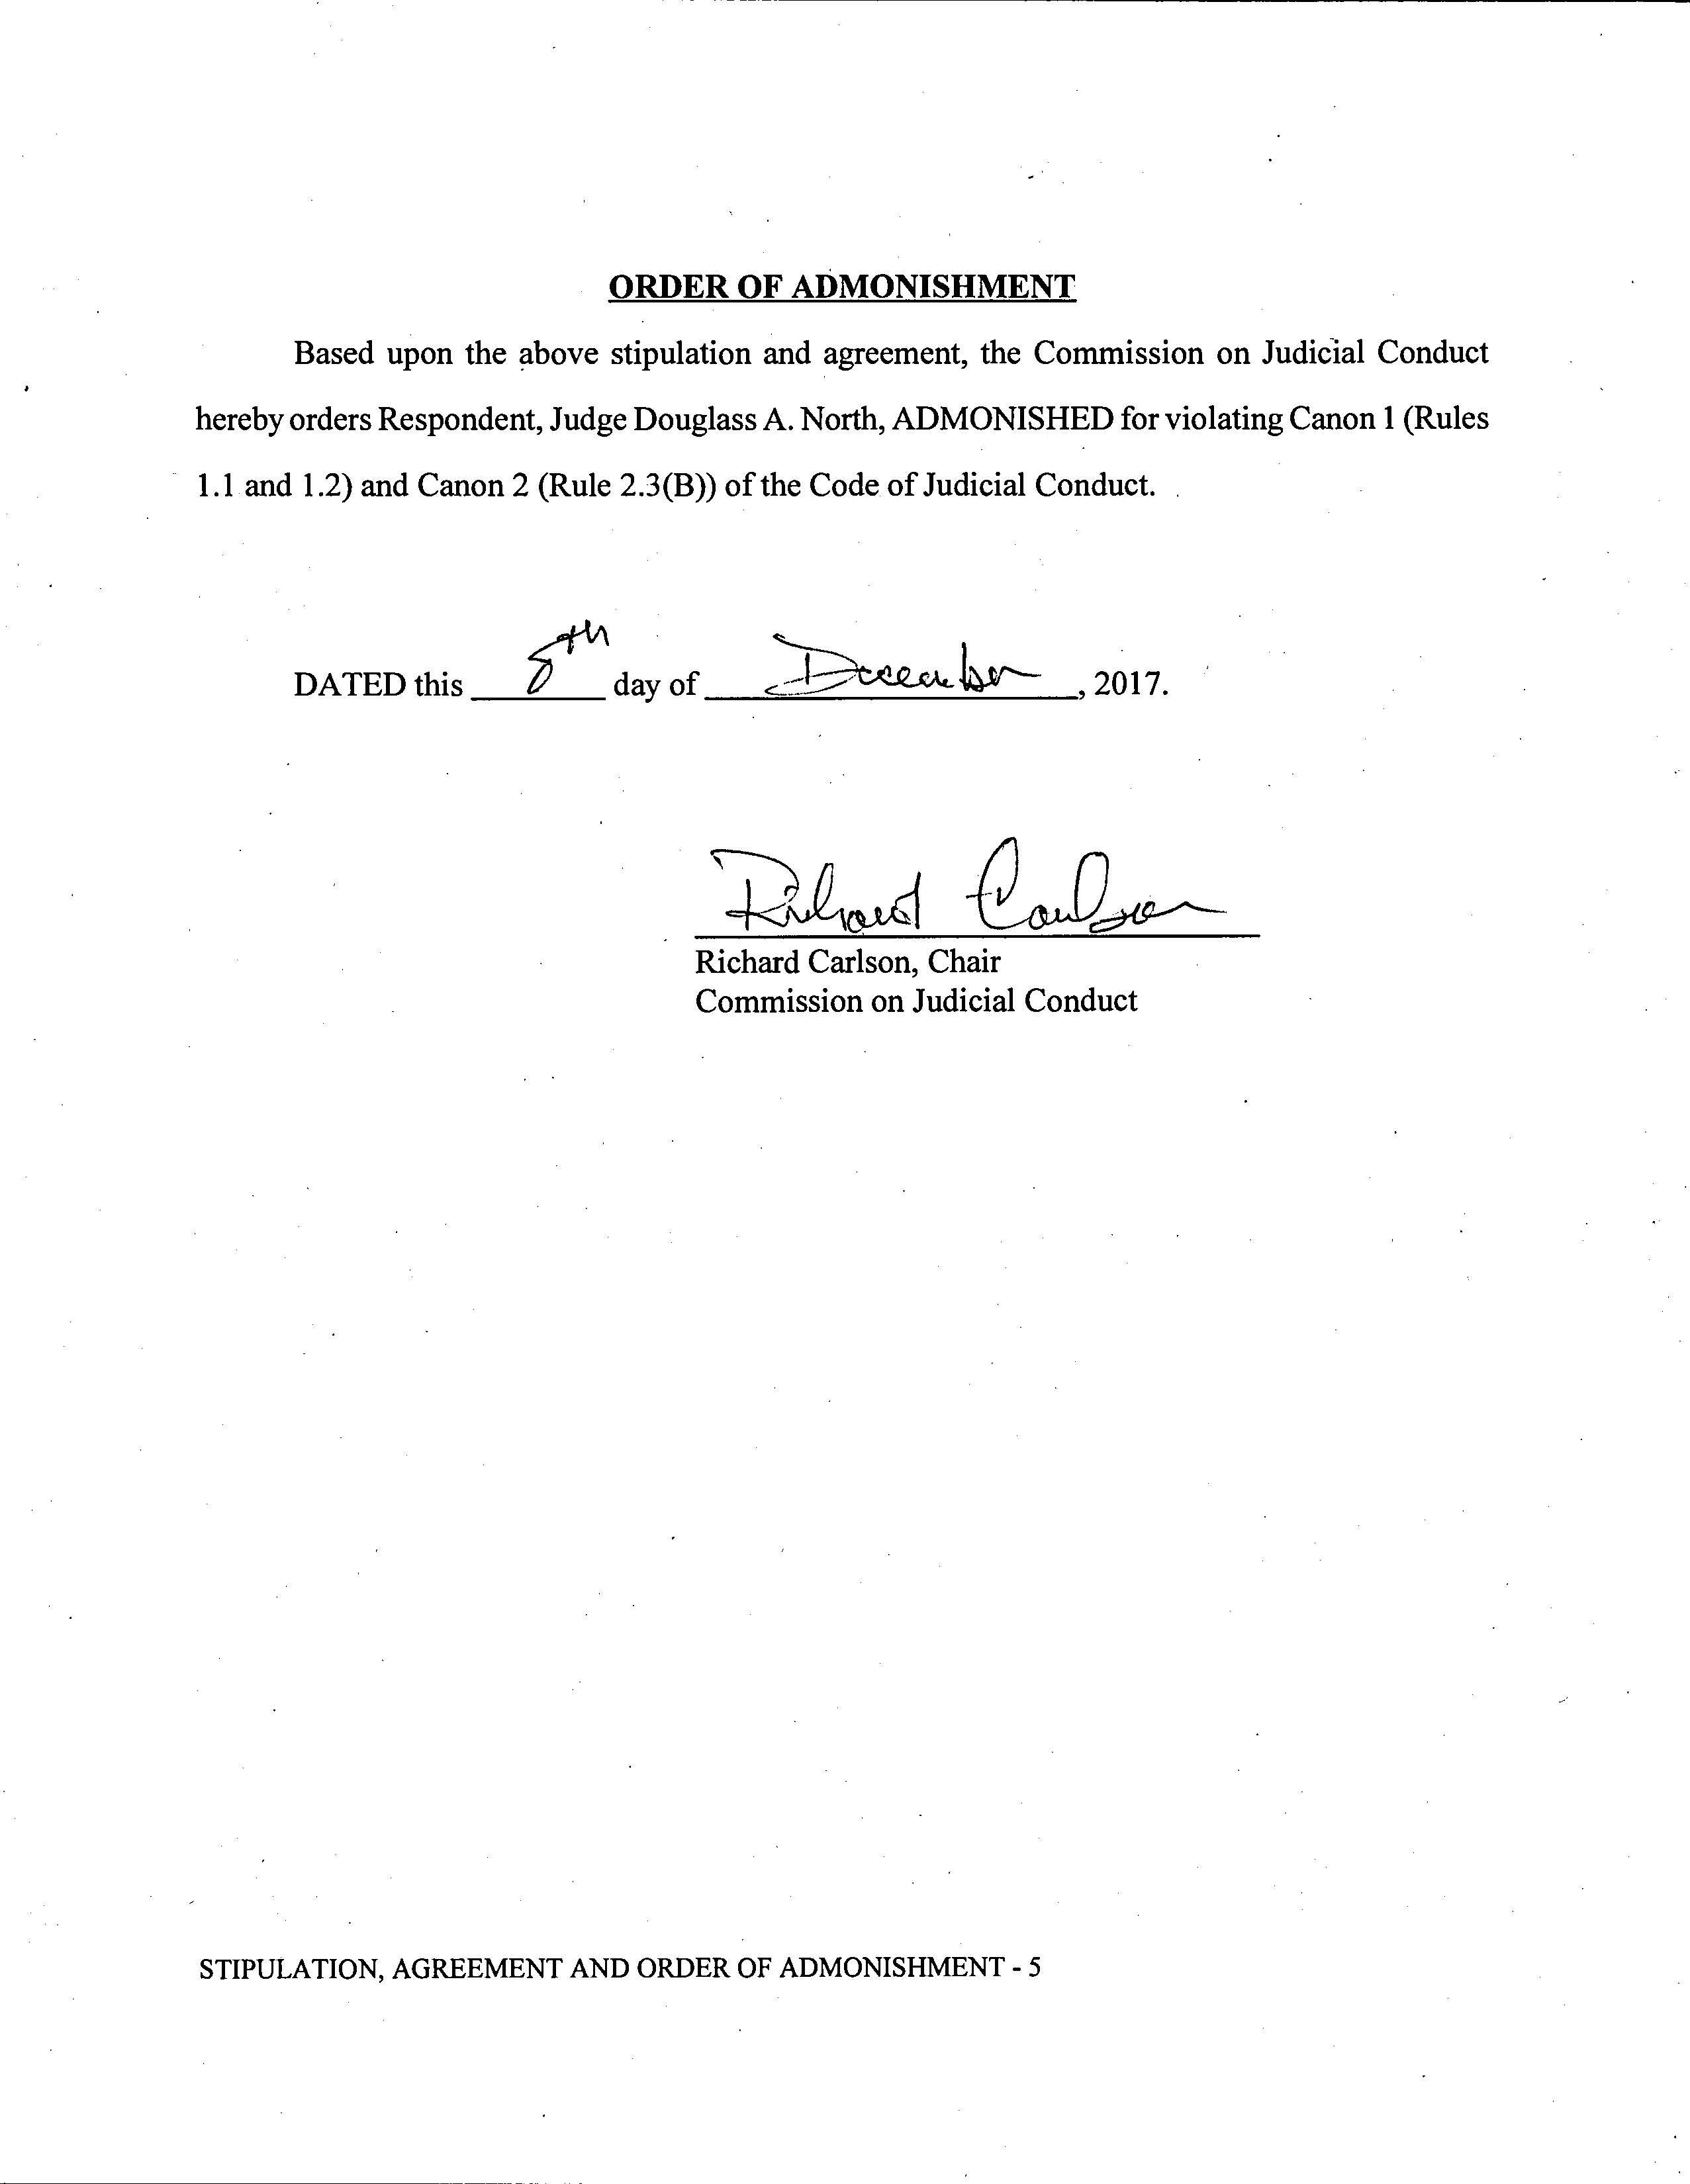 Judge Douglas North Should Resignation_Page_5